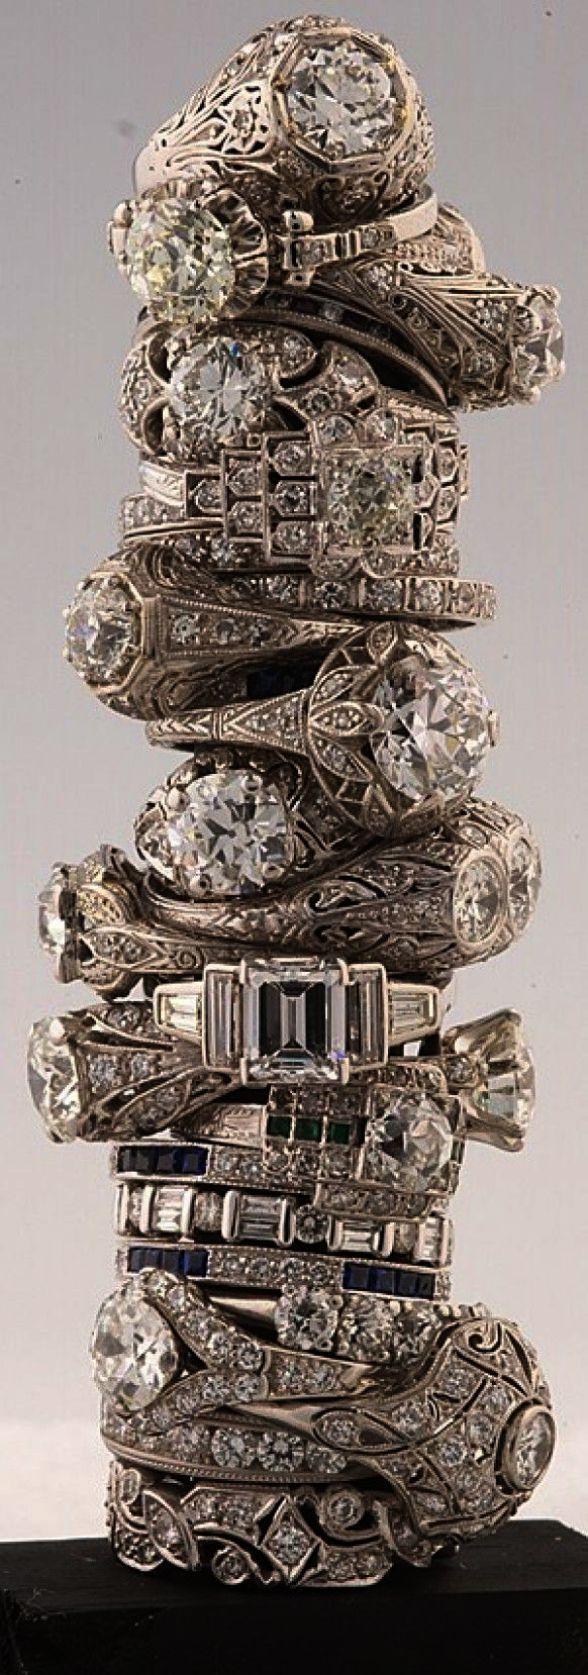 Jewellery Tools Online India before Jewellery Box Nz lest